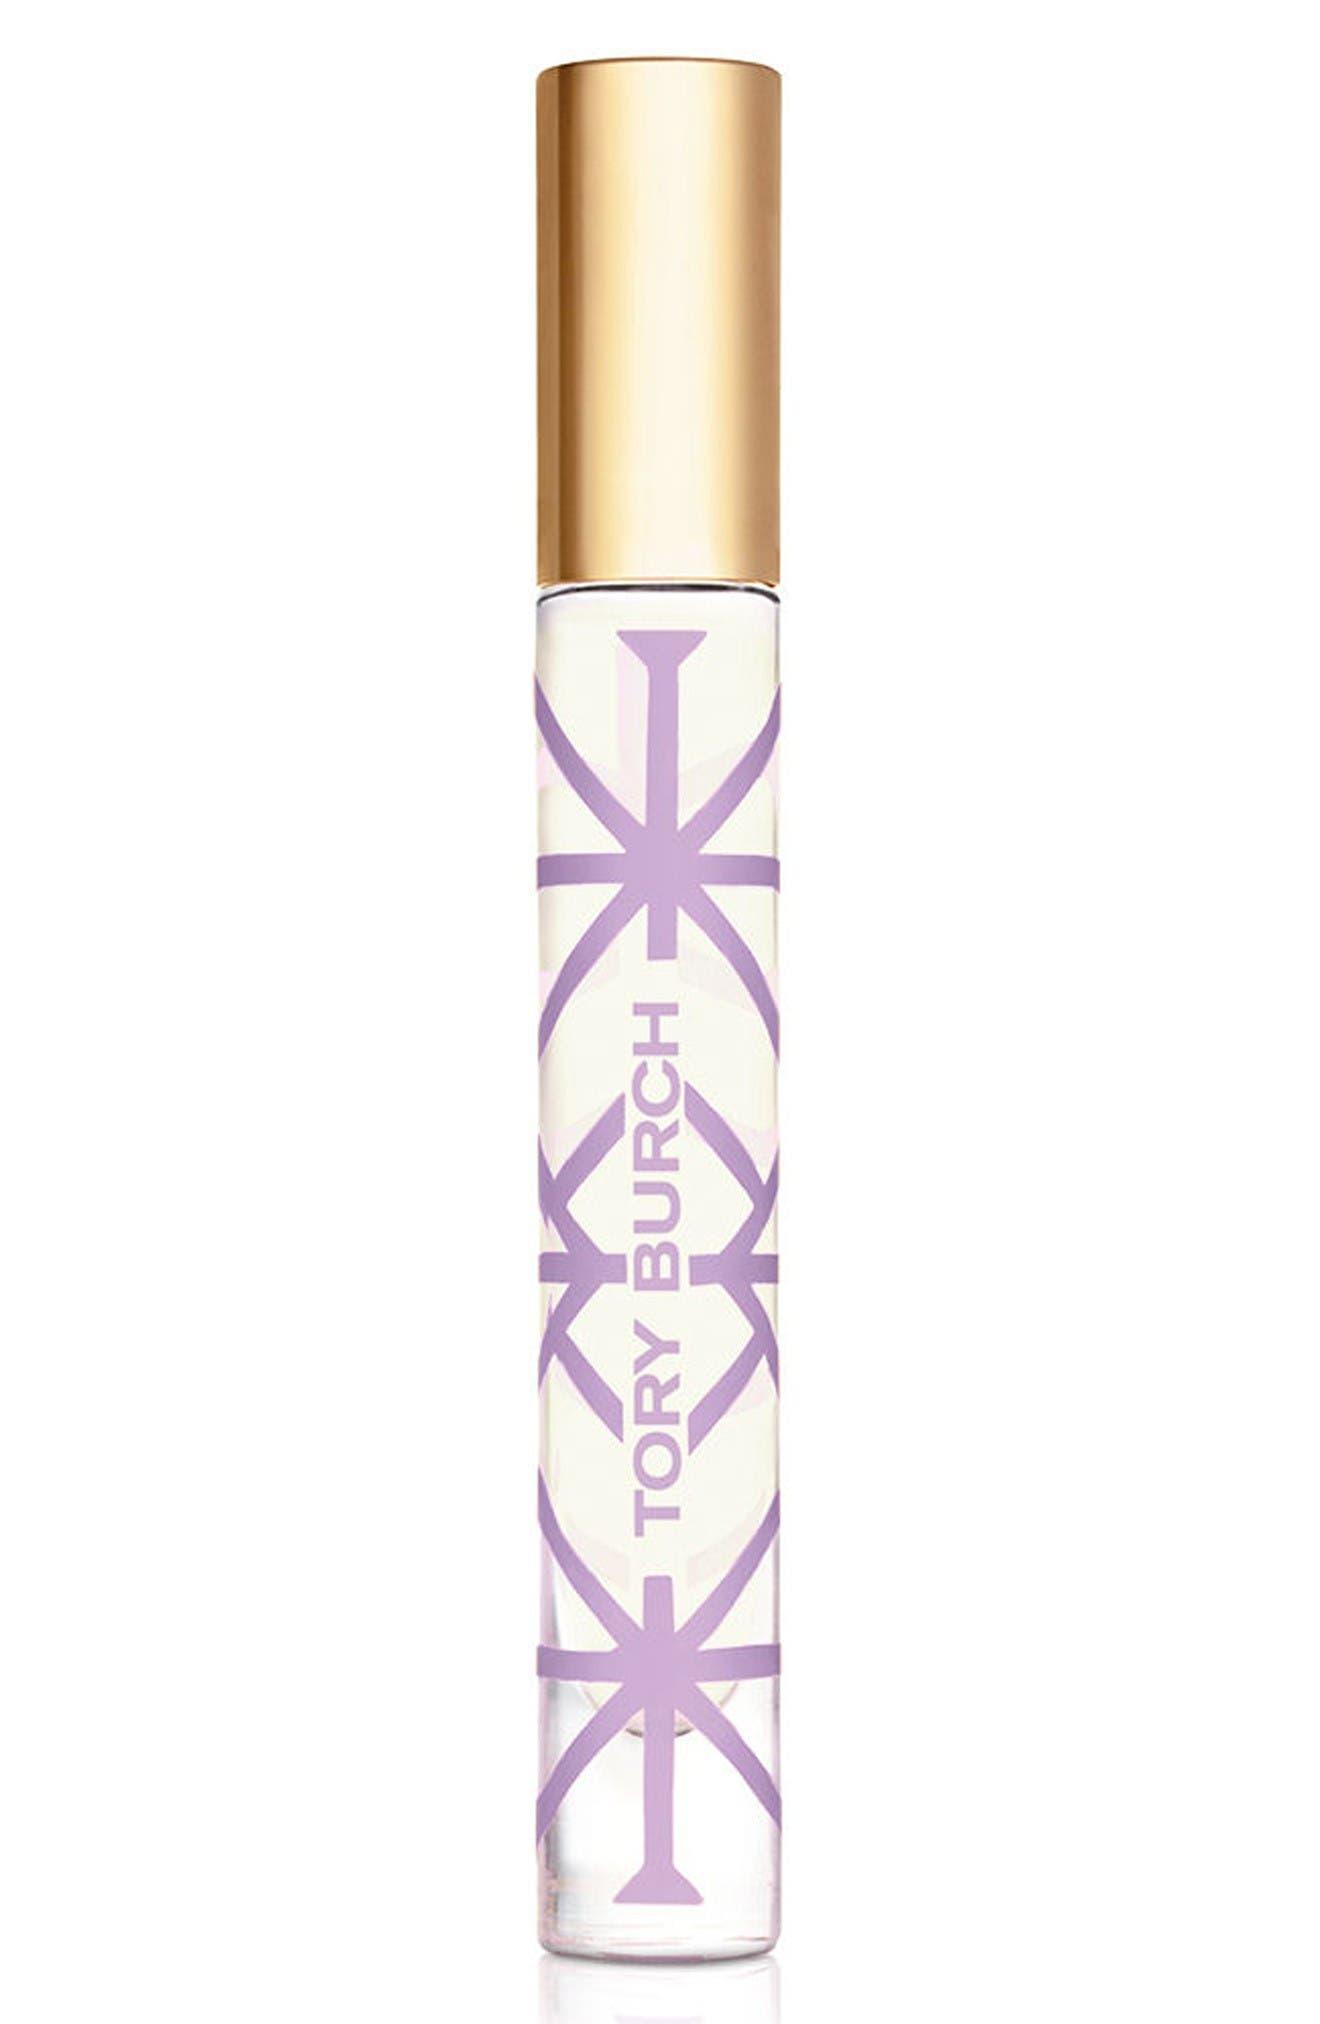 Alternate Image 1 Selected - Tory Burch Jolie Fleur Lavande Eau de Parfum Rollerball